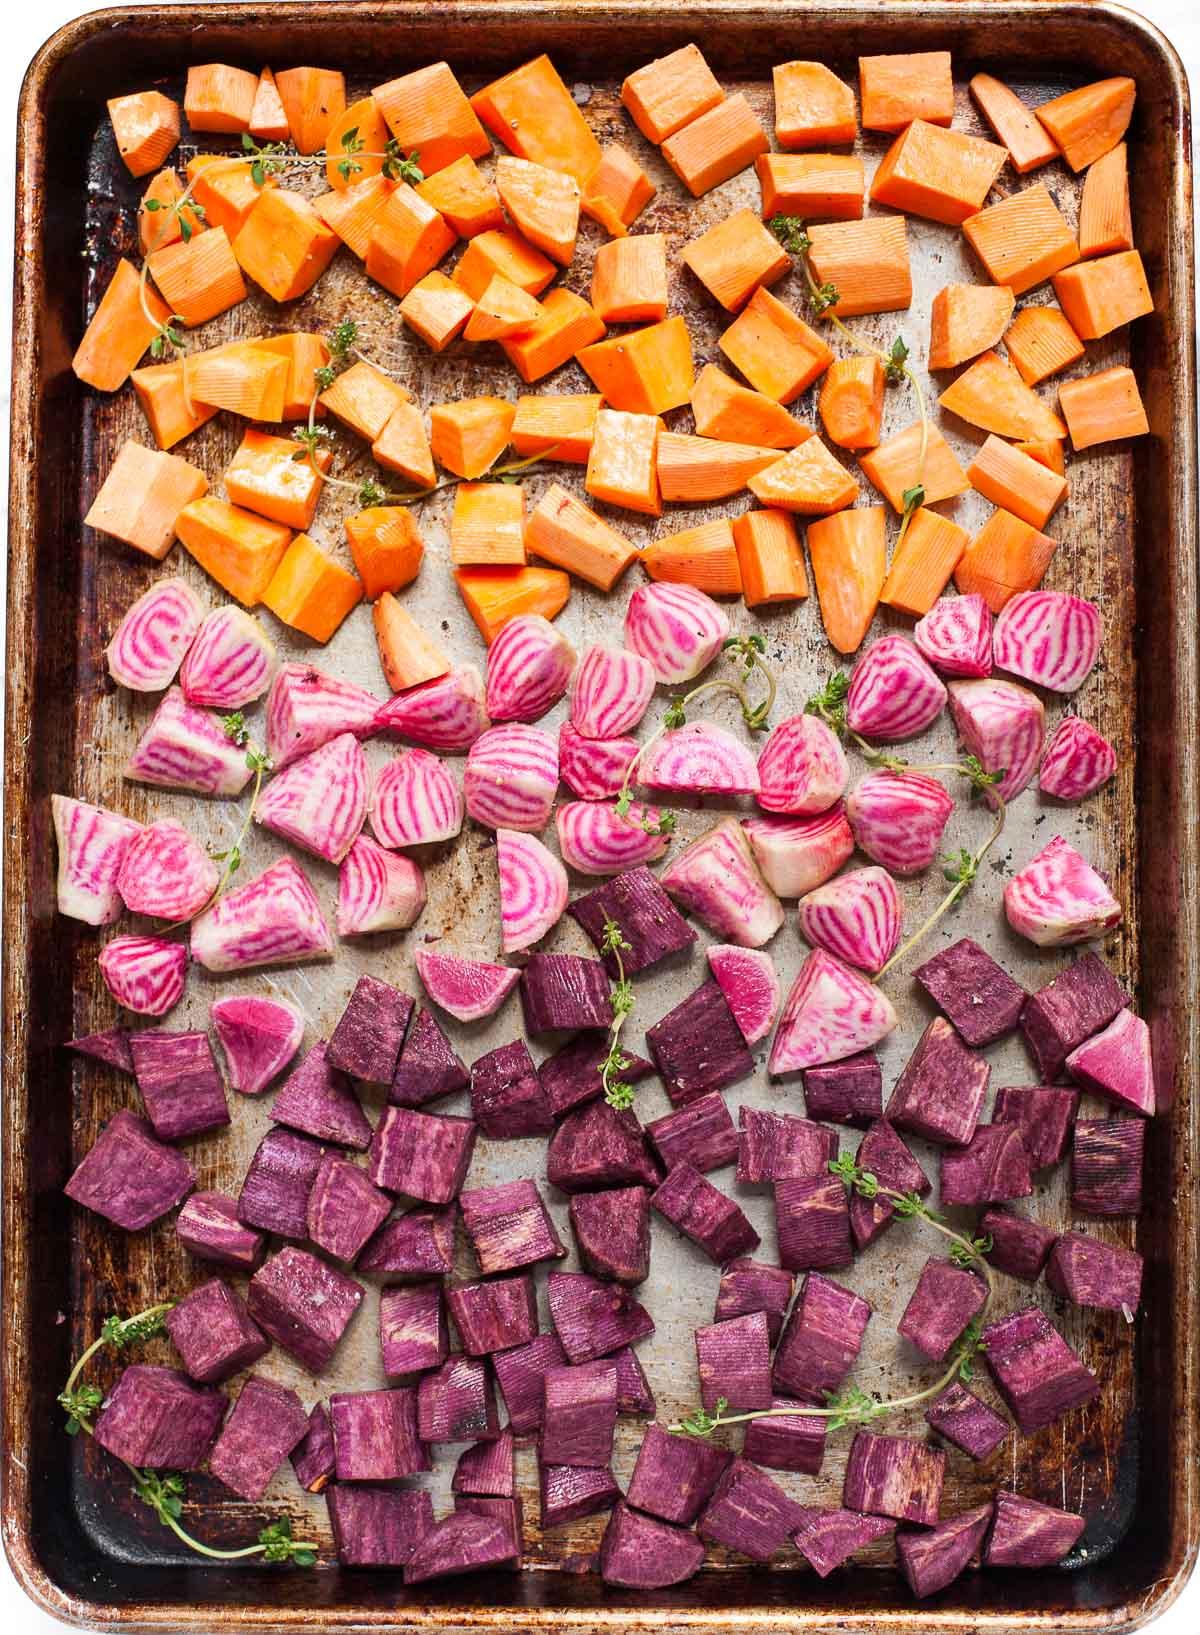 Roasted Beets & Sweet Potatoes